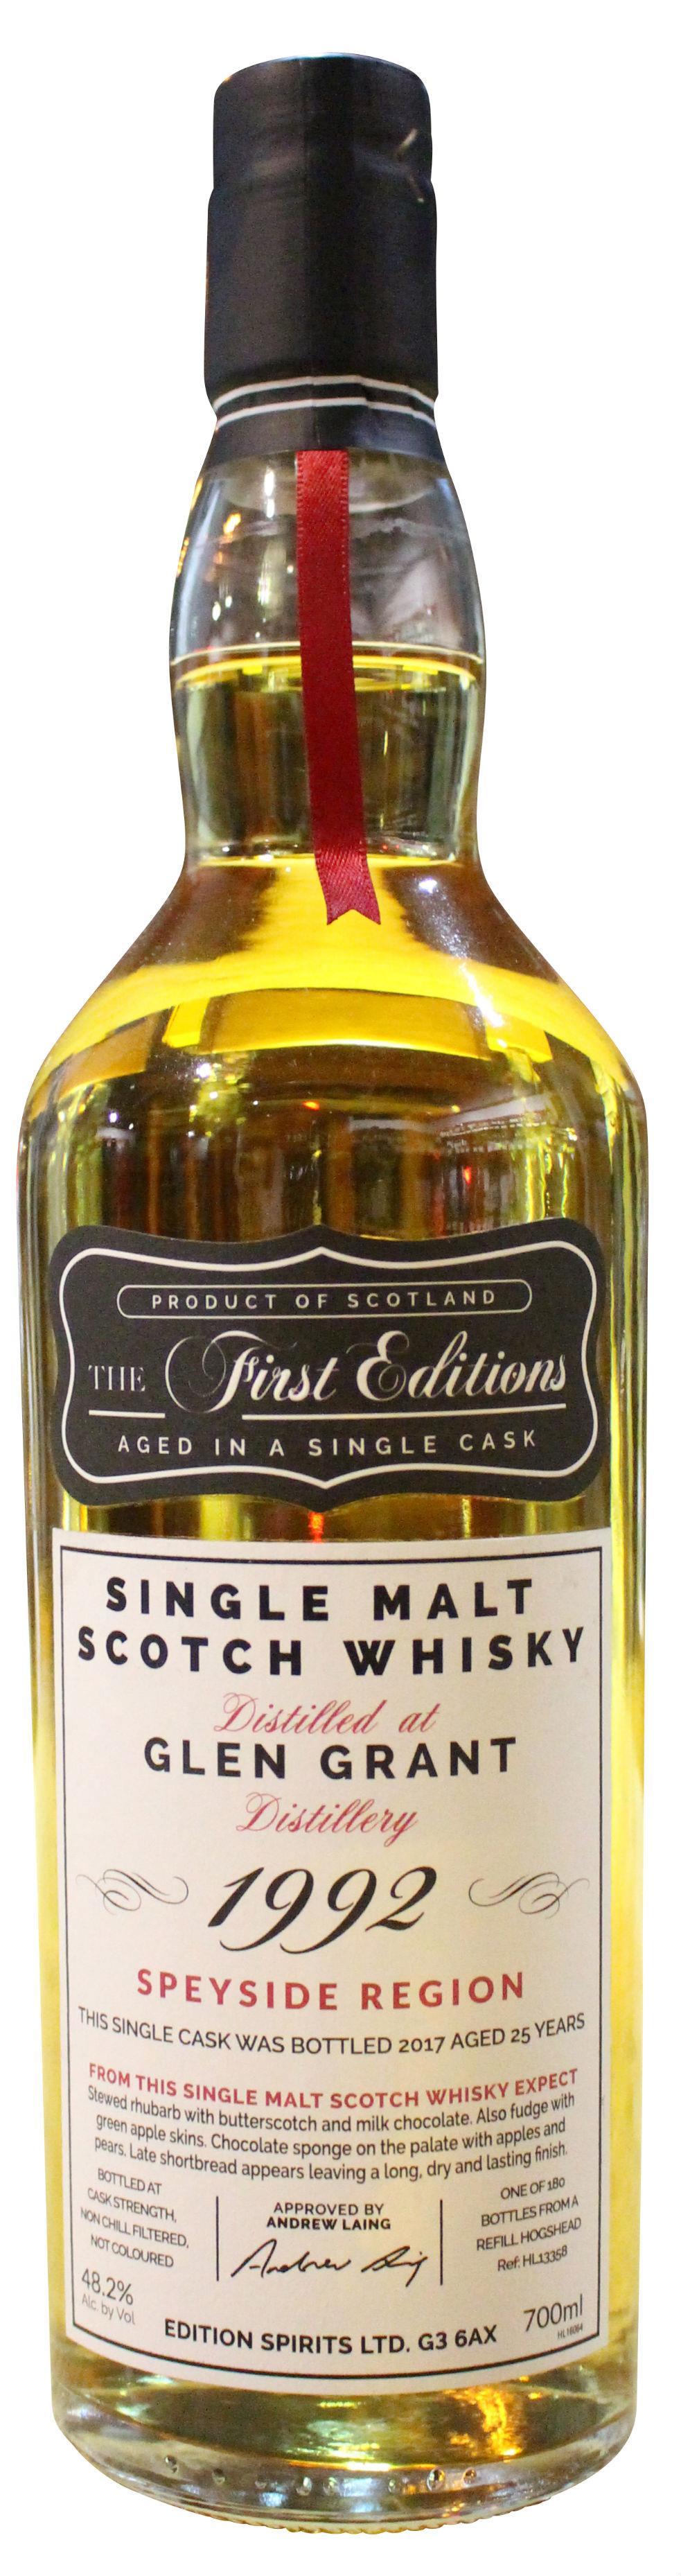 Glen Grant The First Editions Single Malt Scotch Whisky 25 y.o. - 1992er